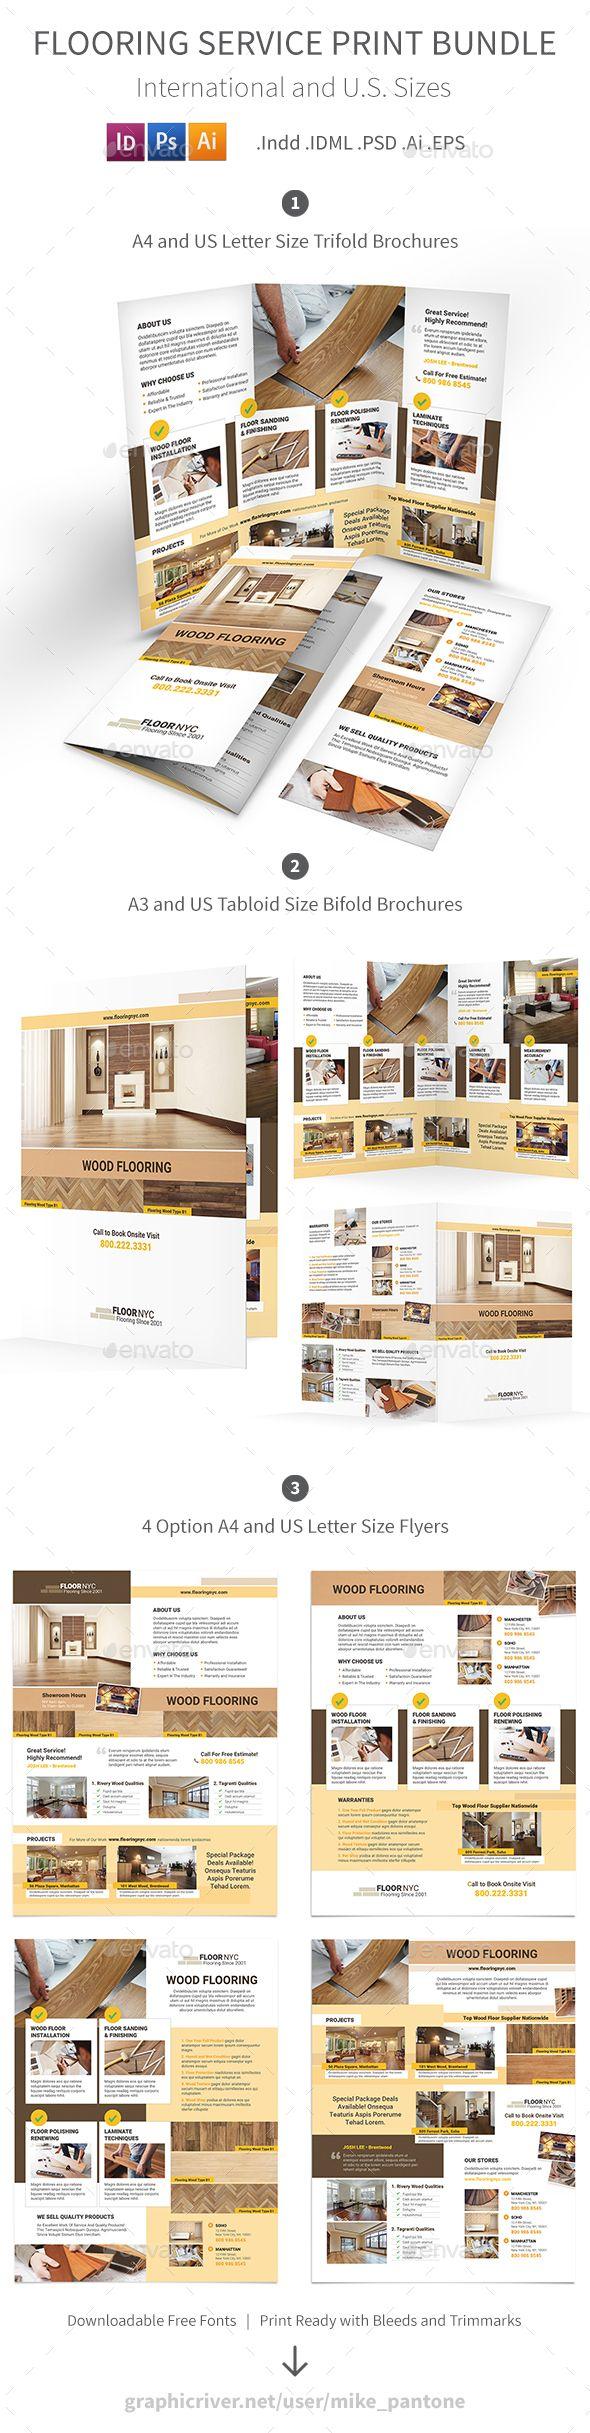 flooring service print bundle informational brochures brochure